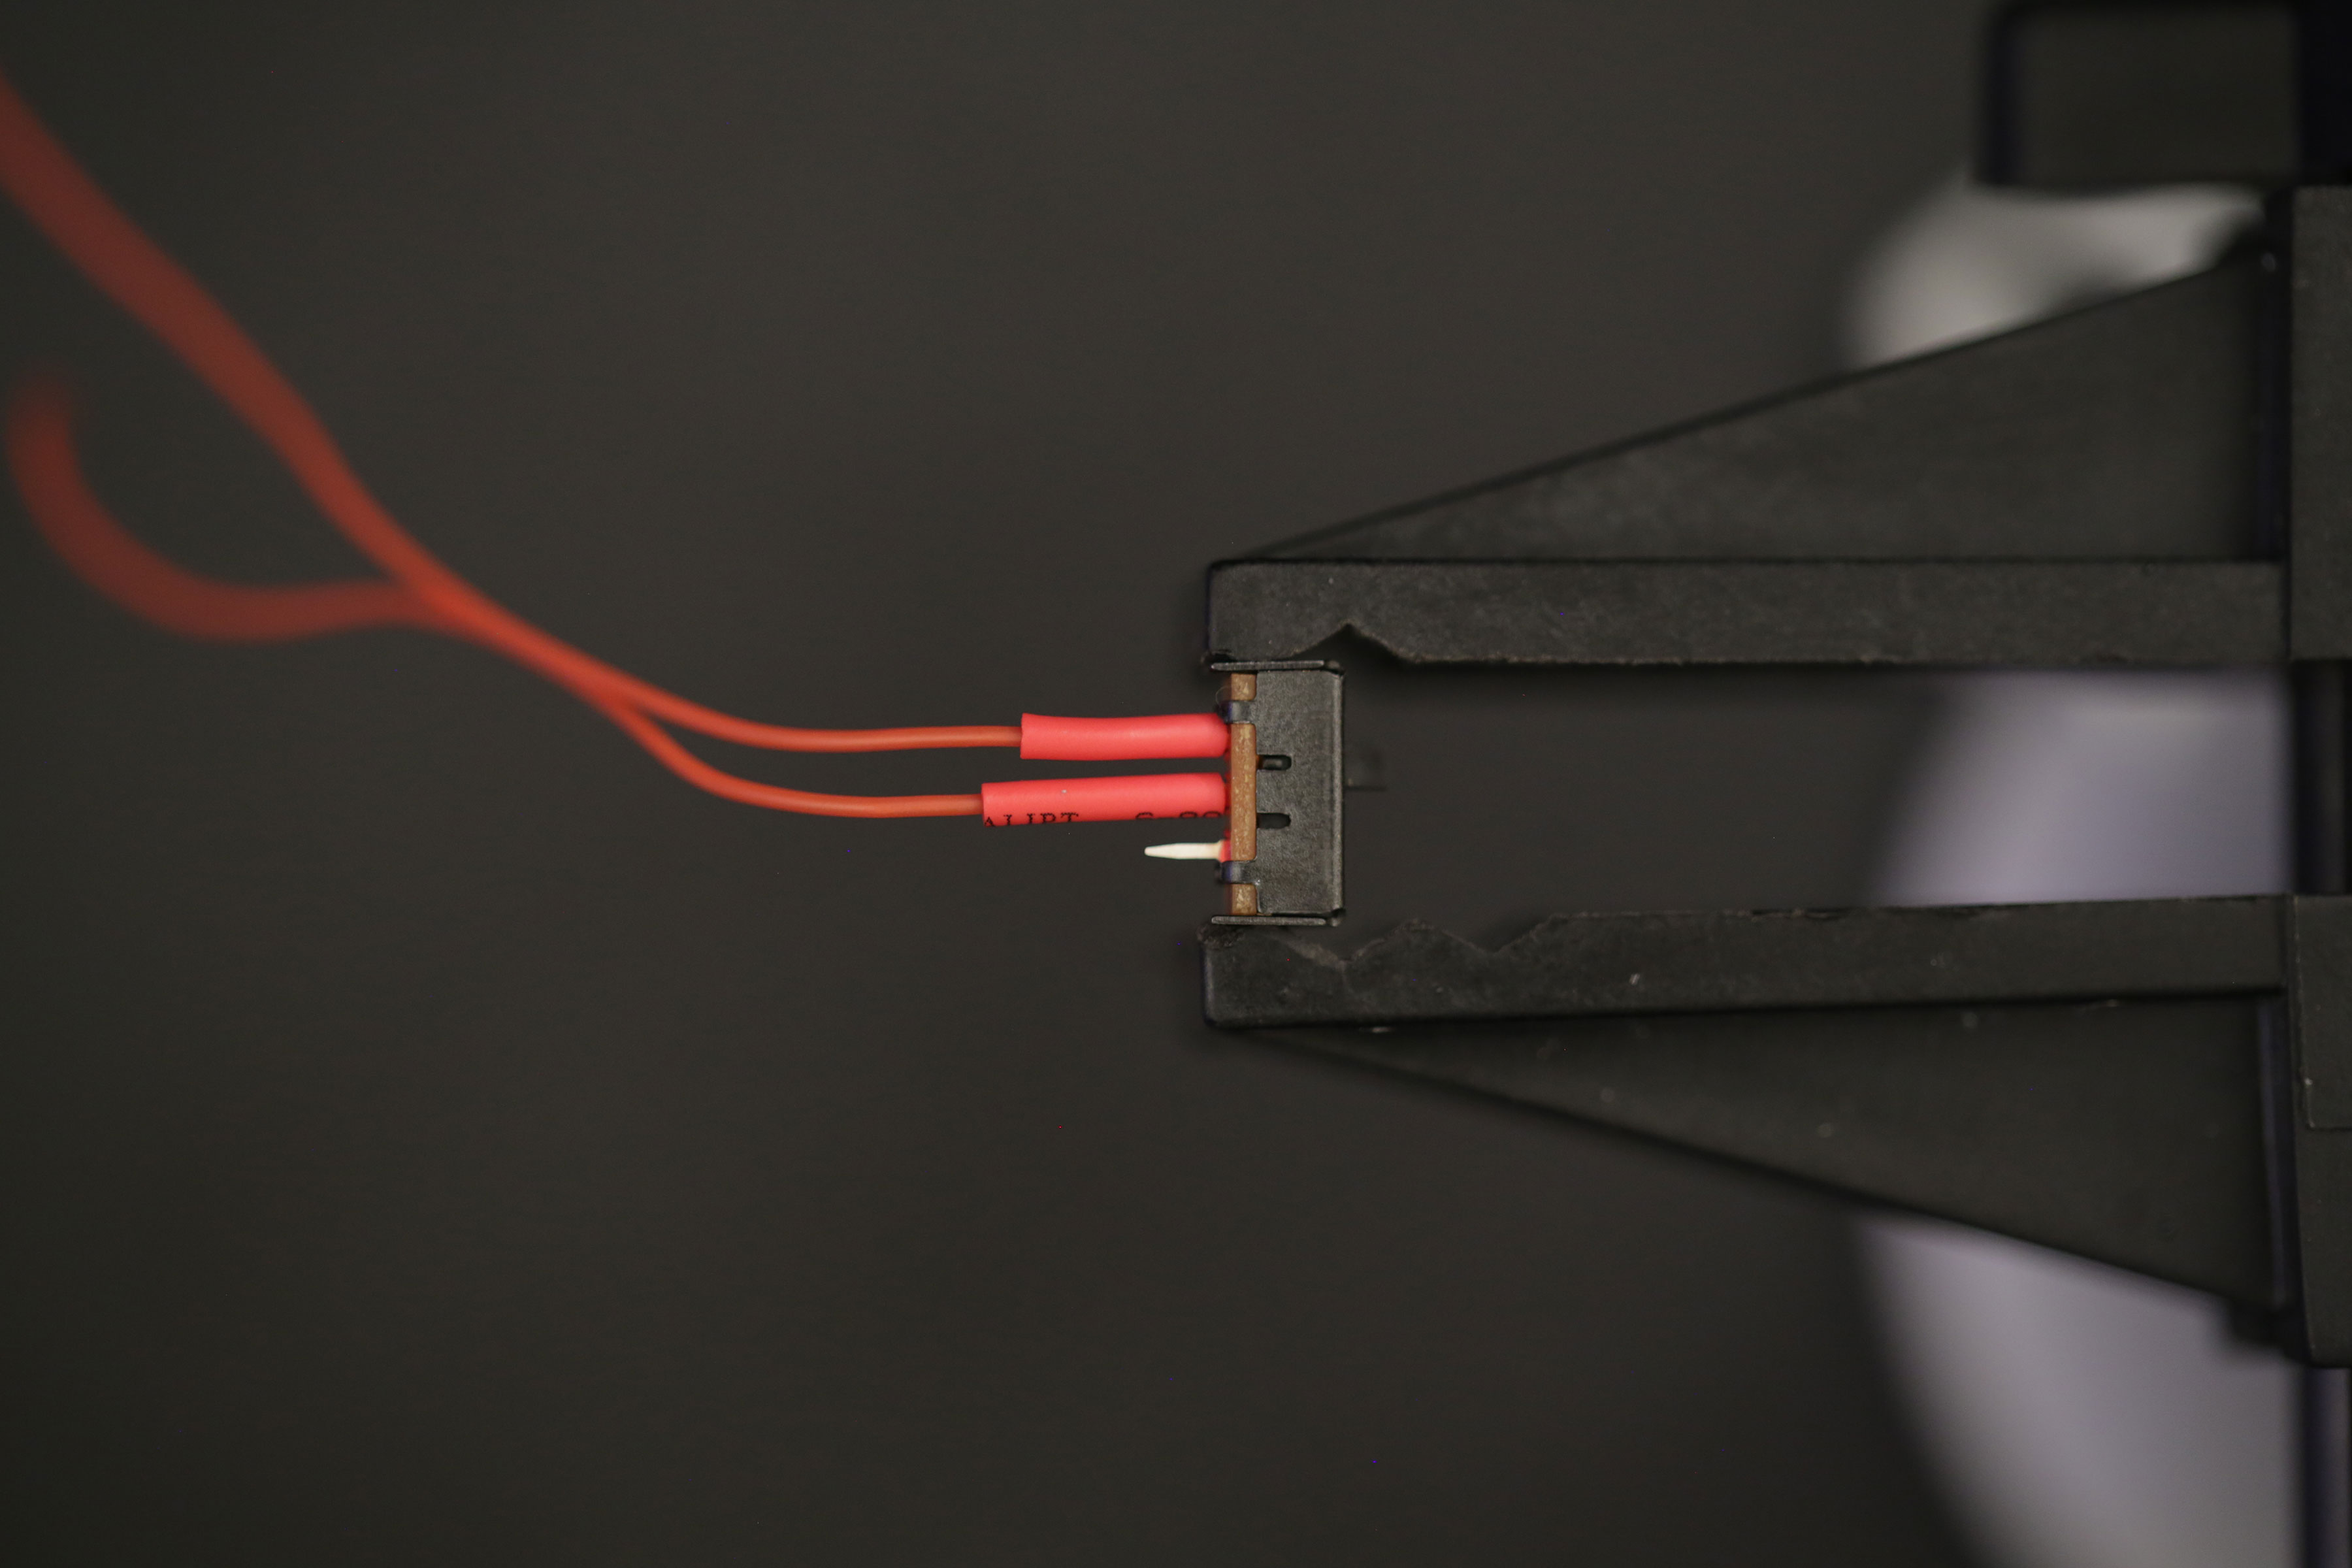 gaming_switch-soldered_heatshrunk.jpg